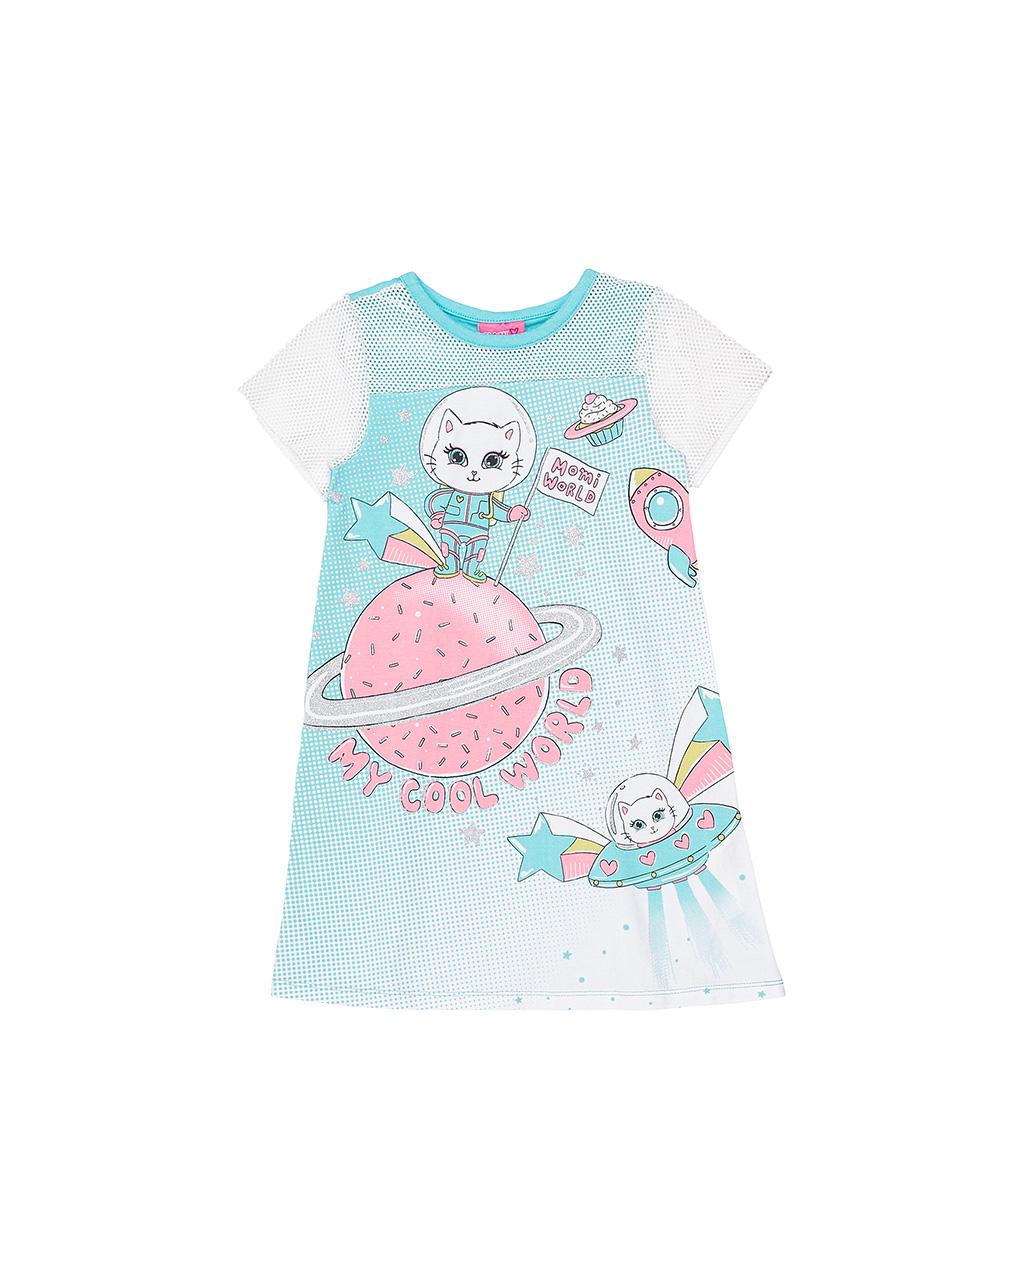 Vestido Infantil Detalhe Tela Momi